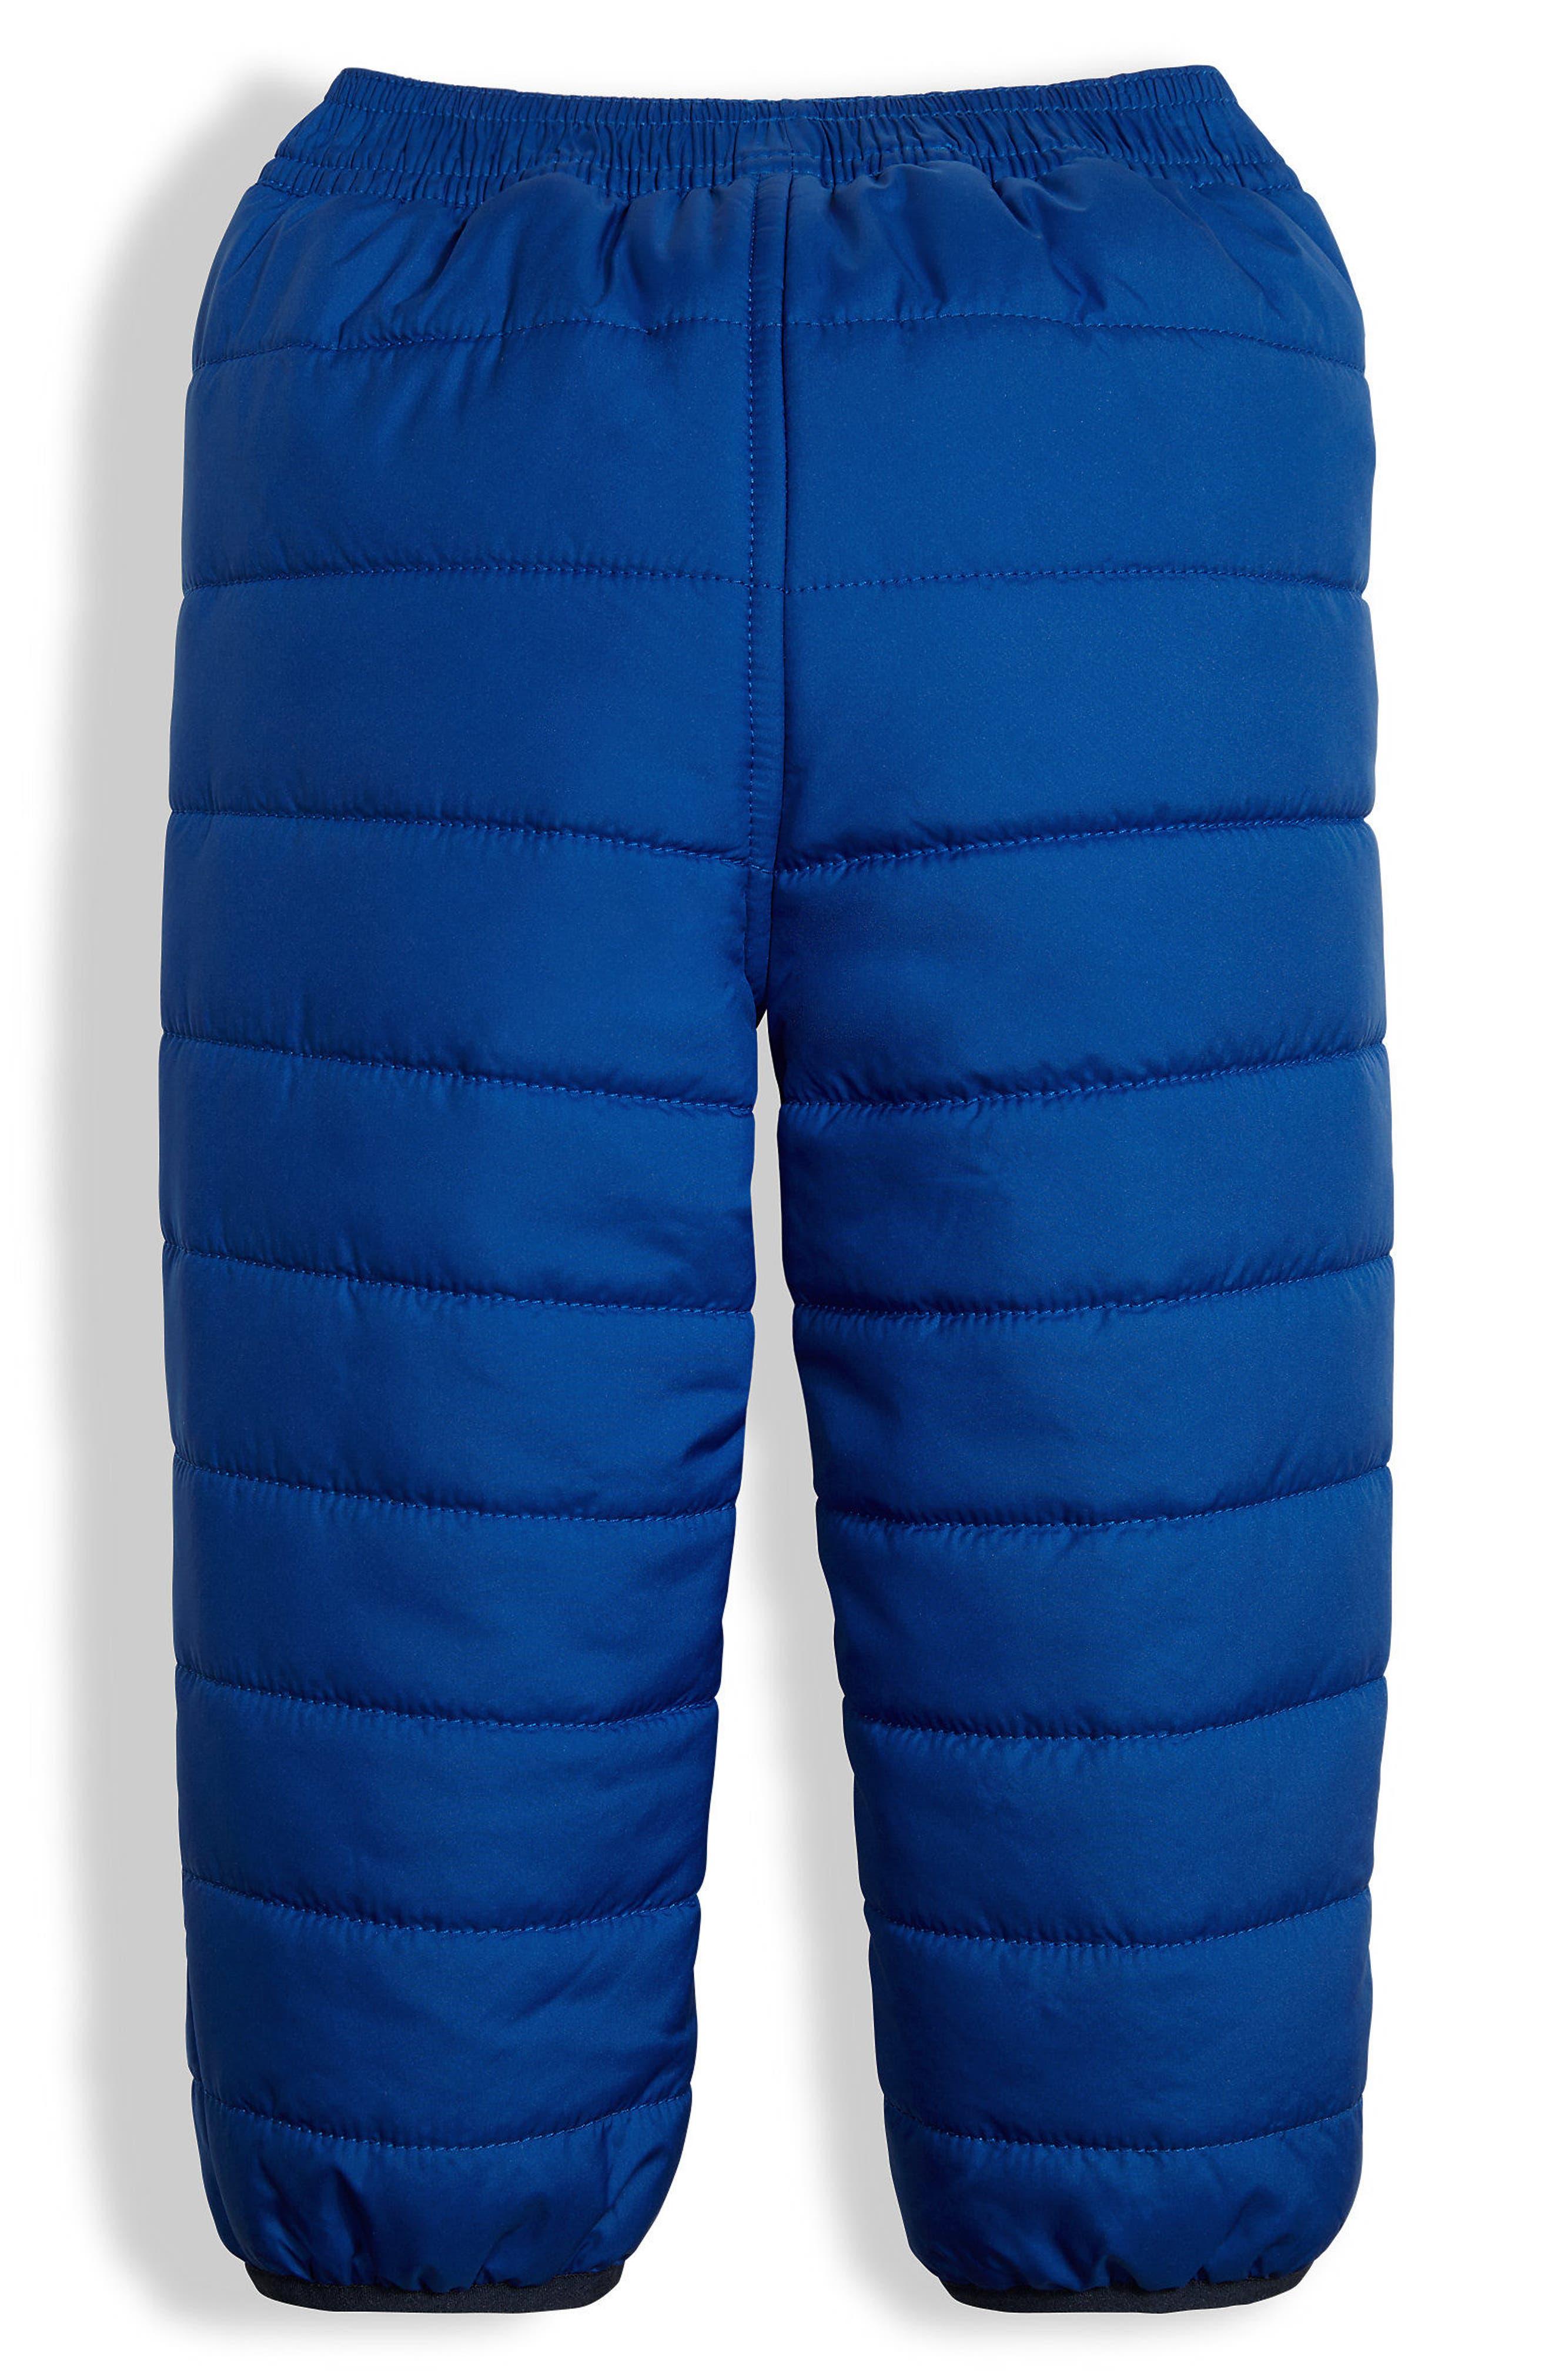 Perrito Reversible Water Repellent Pants,                             Alternate thumbnail 2, color,                             Bright Cobalt Blue